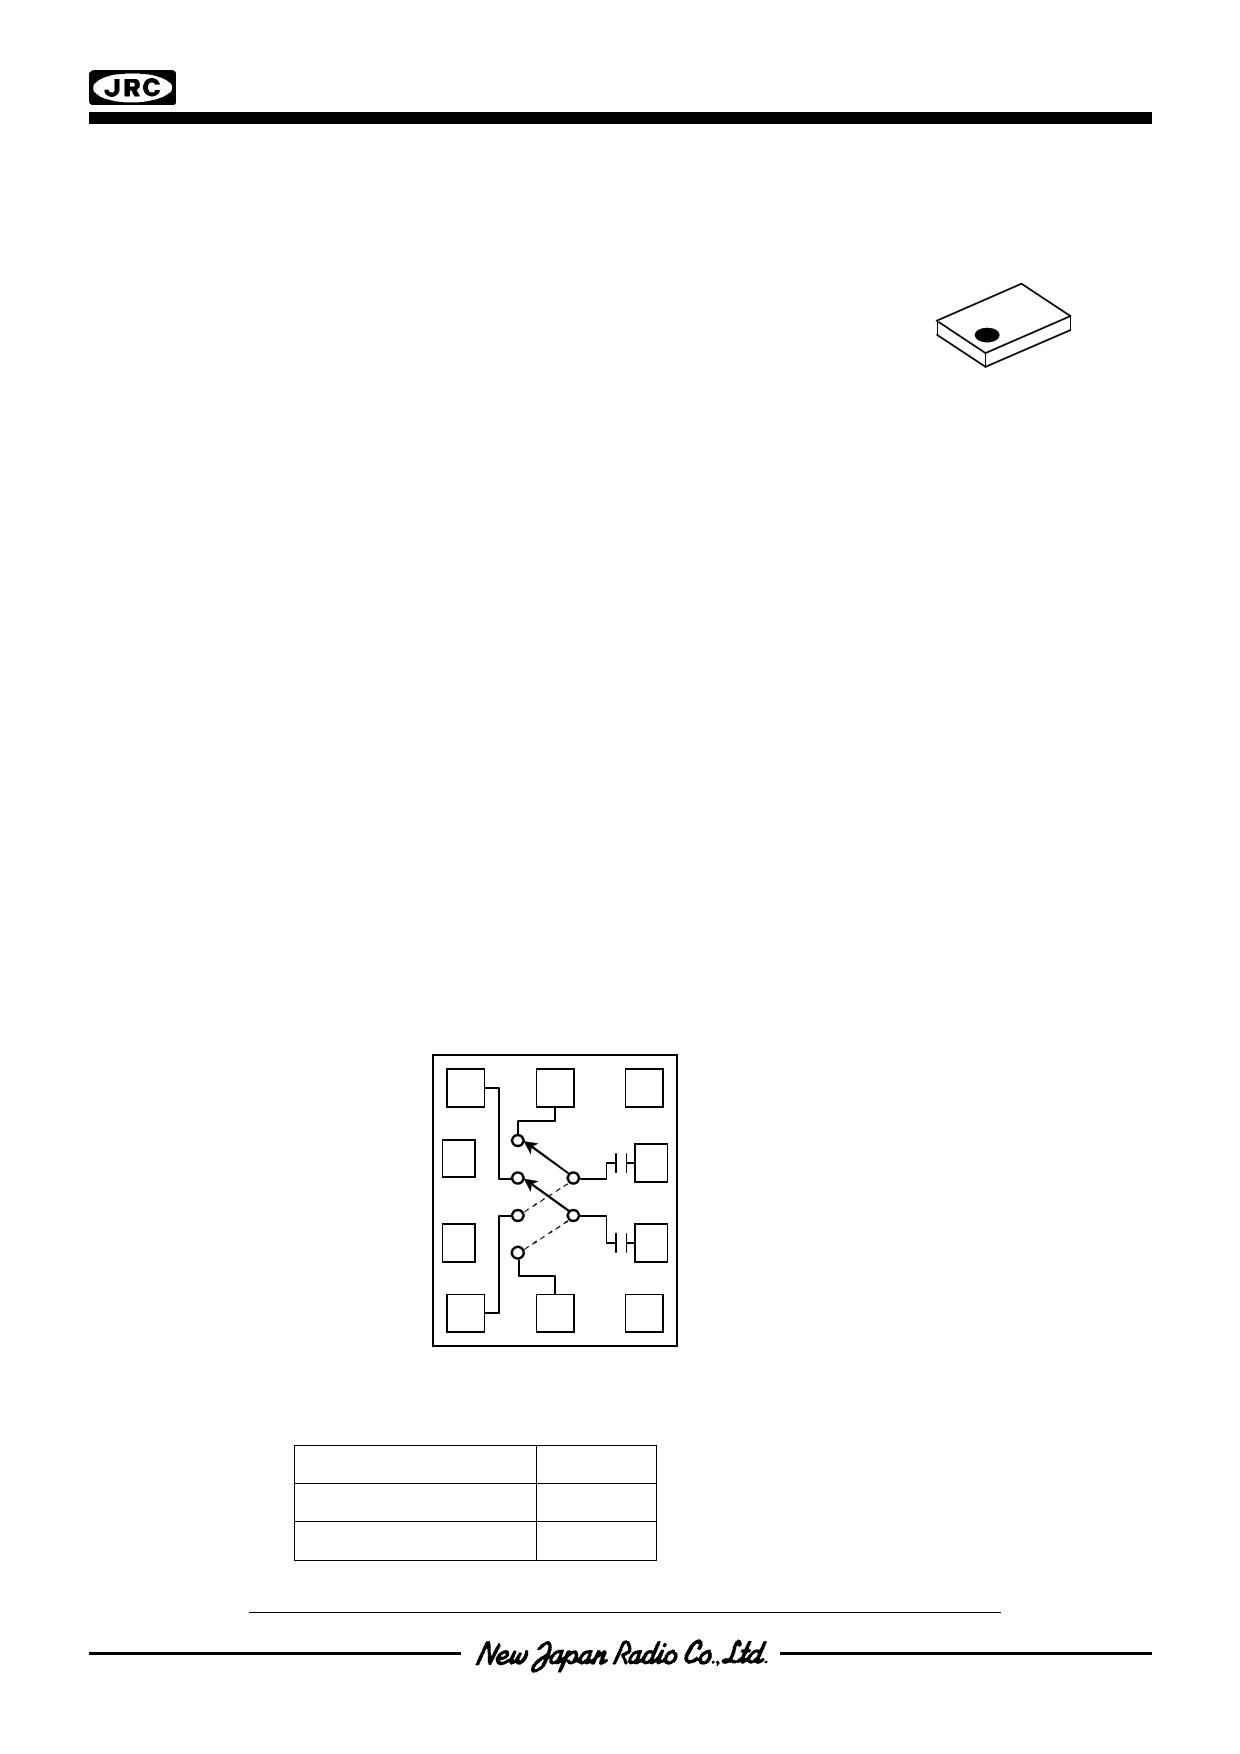 njg1800nb2 datasheet ( high isolation x-spdt (dp4t) switch )